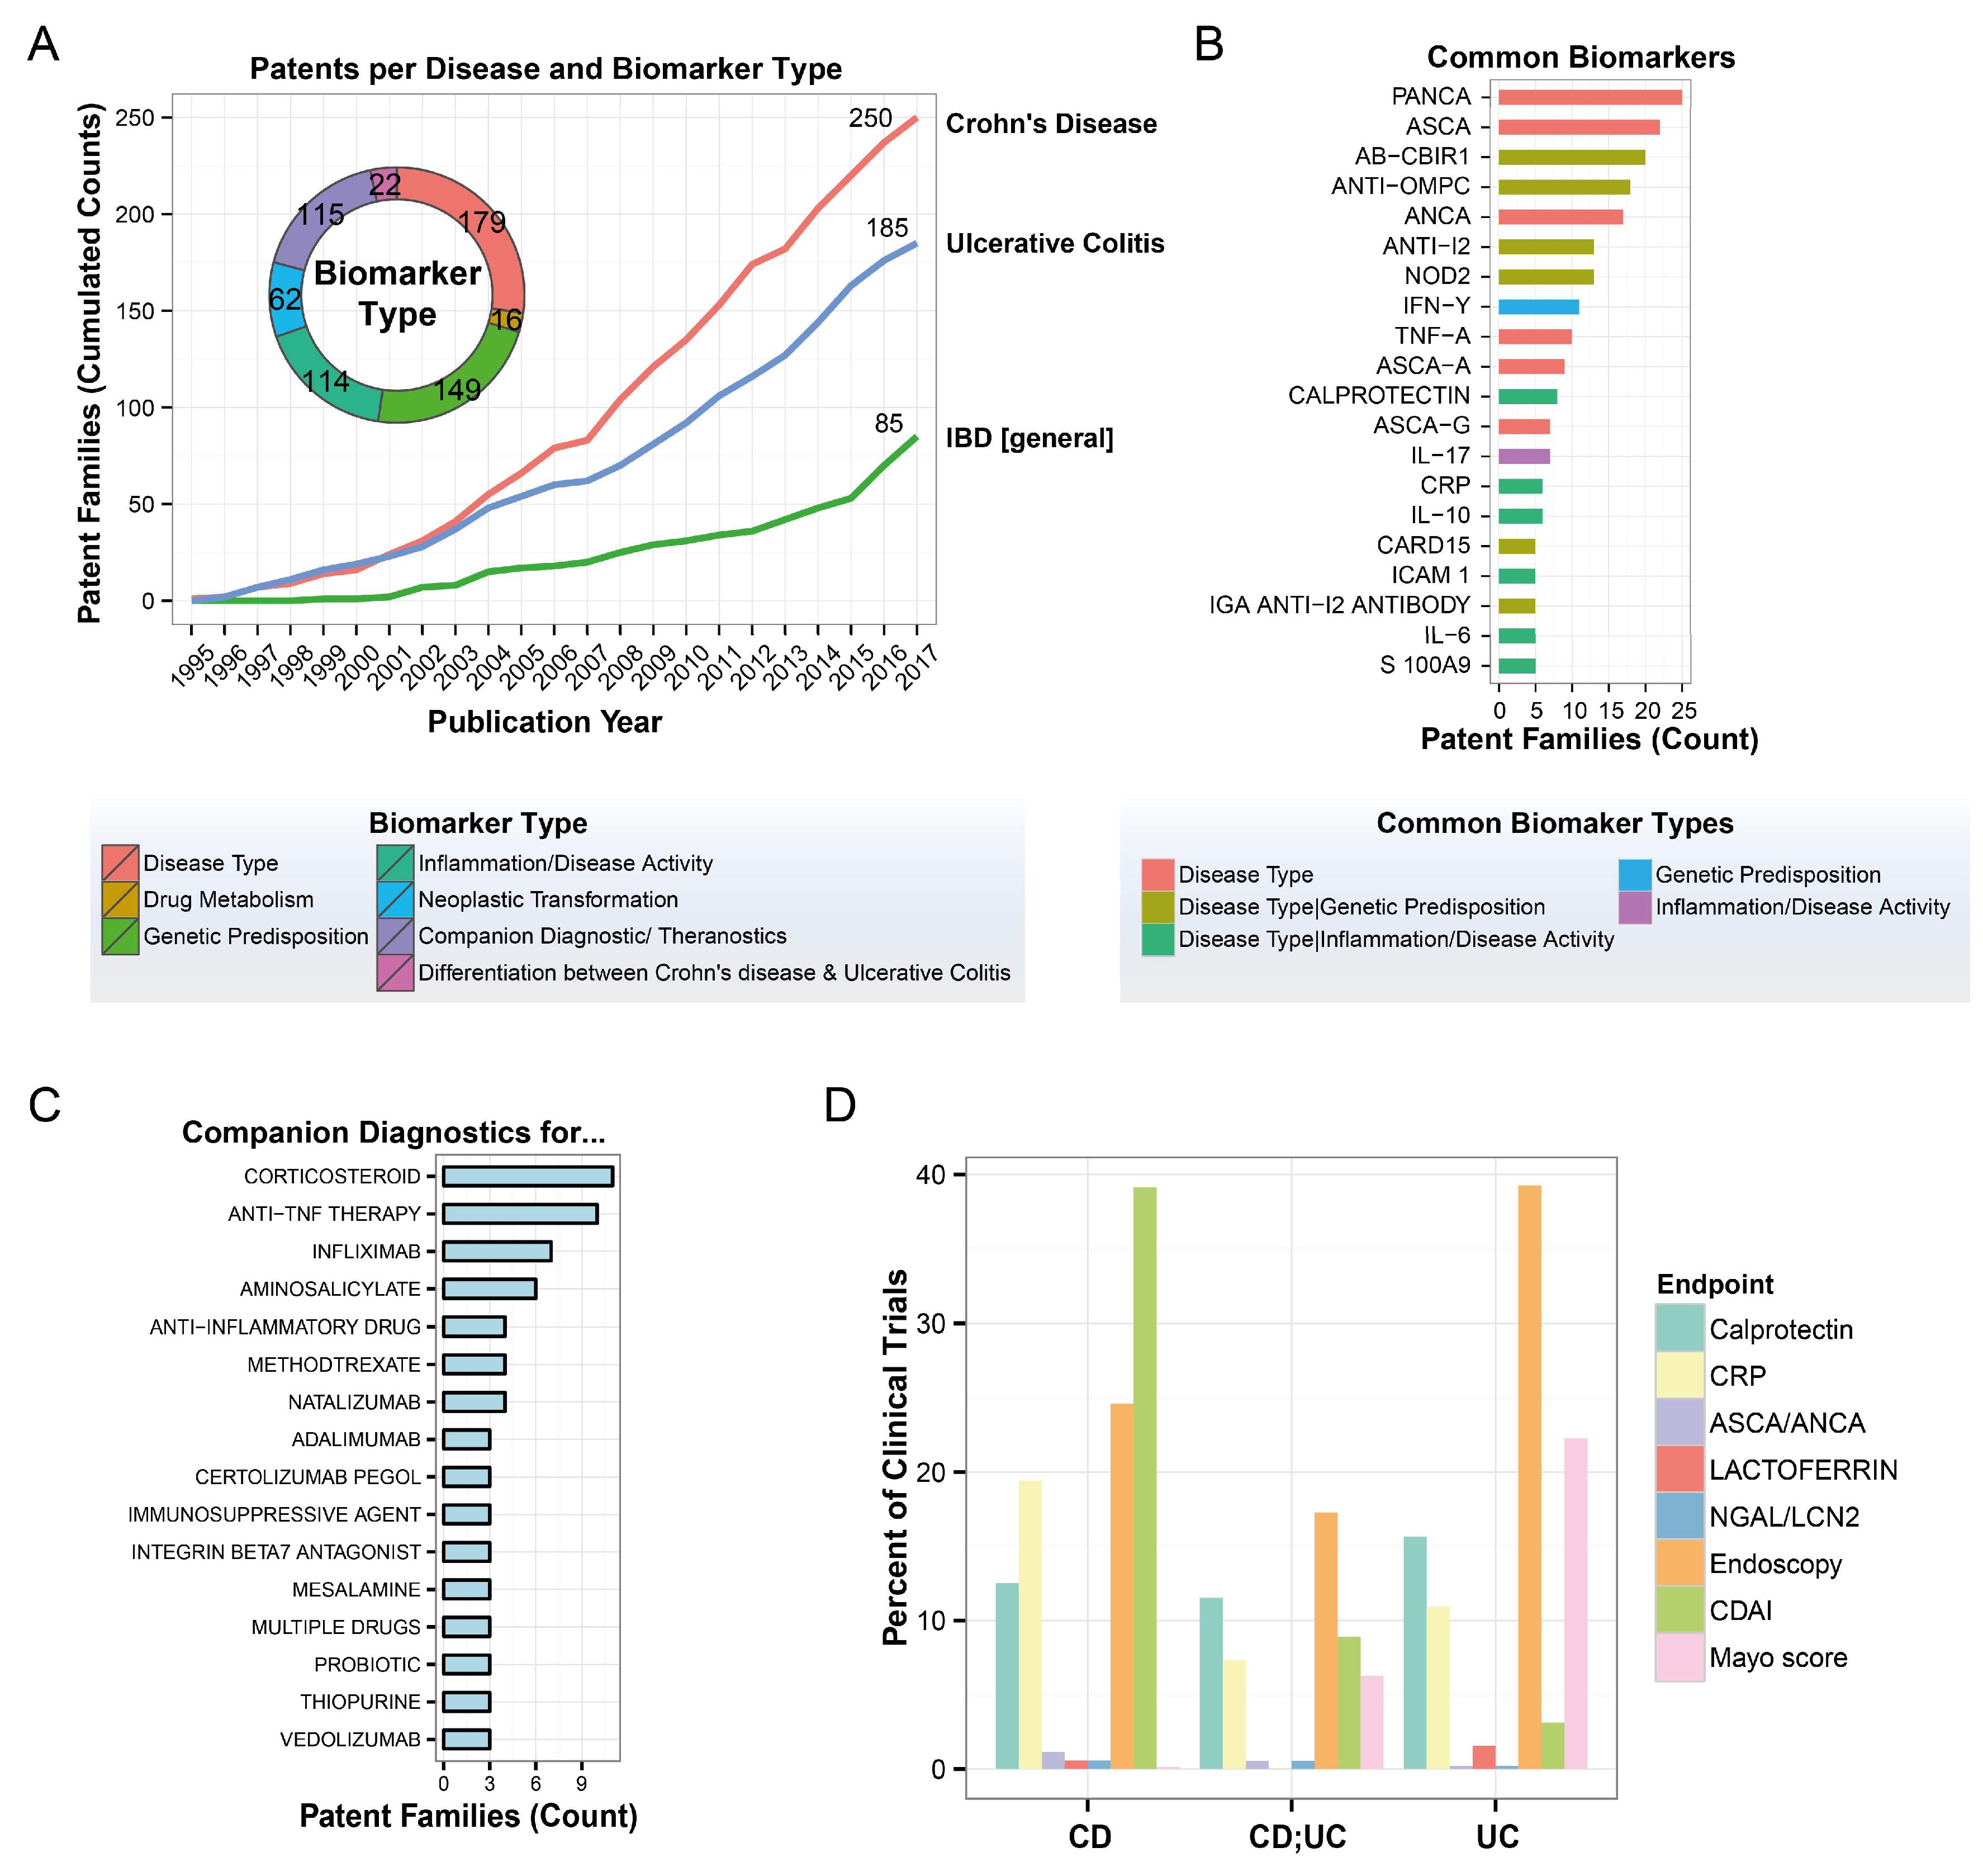 Ijms Free Full Text Proteomics And Lipidomics In Inflammatory 2009 Mack Wiring Diagrams Blower 19 02775 G002